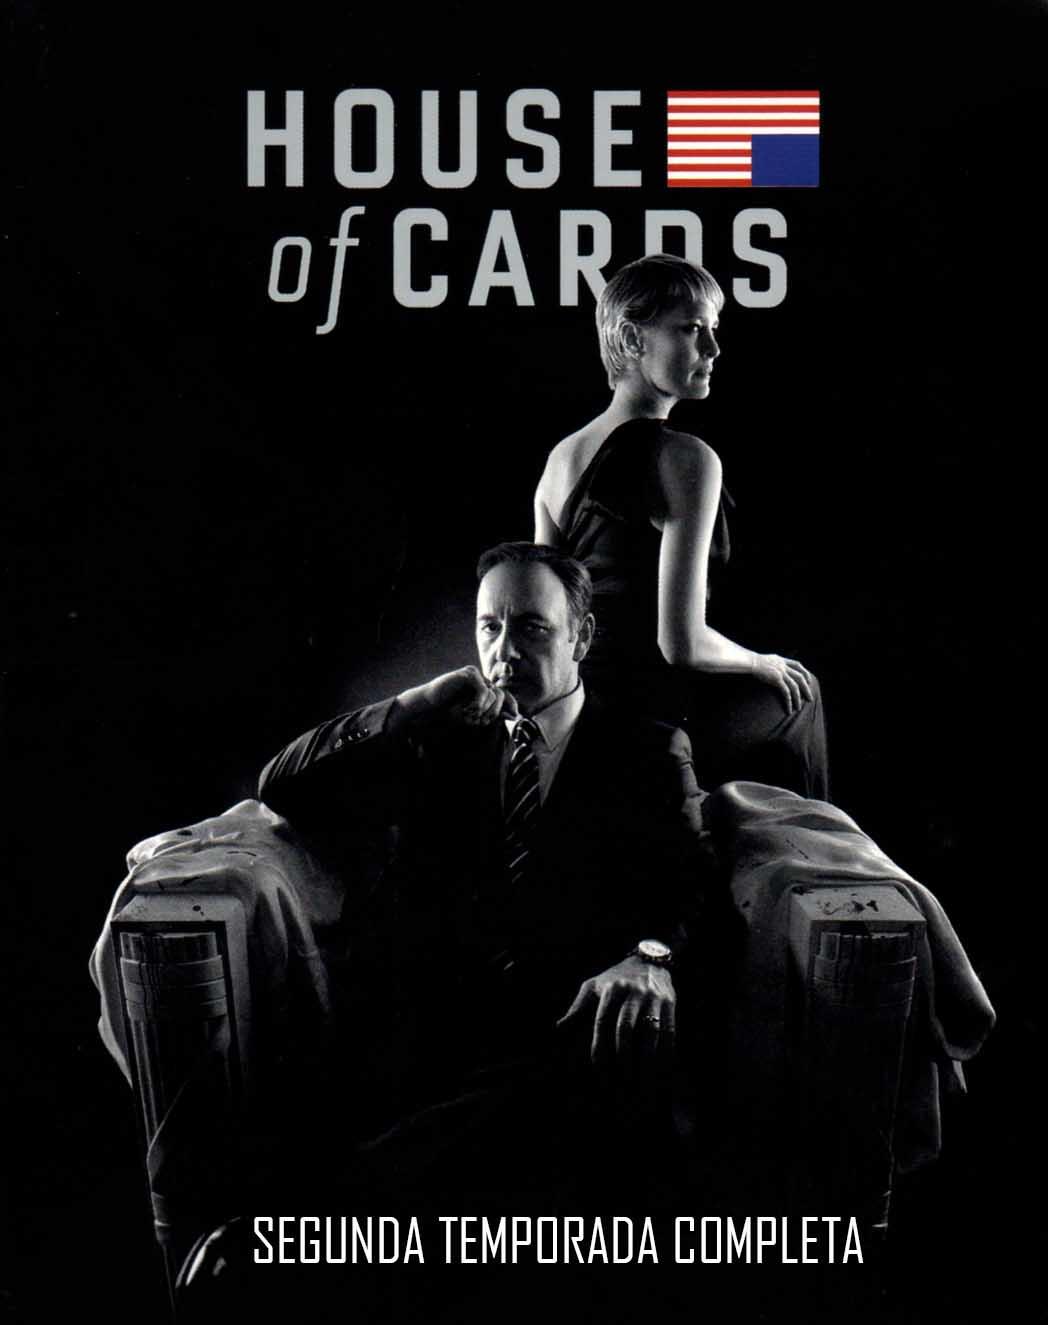 House of Cards 2ª Temporada Torrent - Blu-ray Rip 720p Dual Áudio (2014)